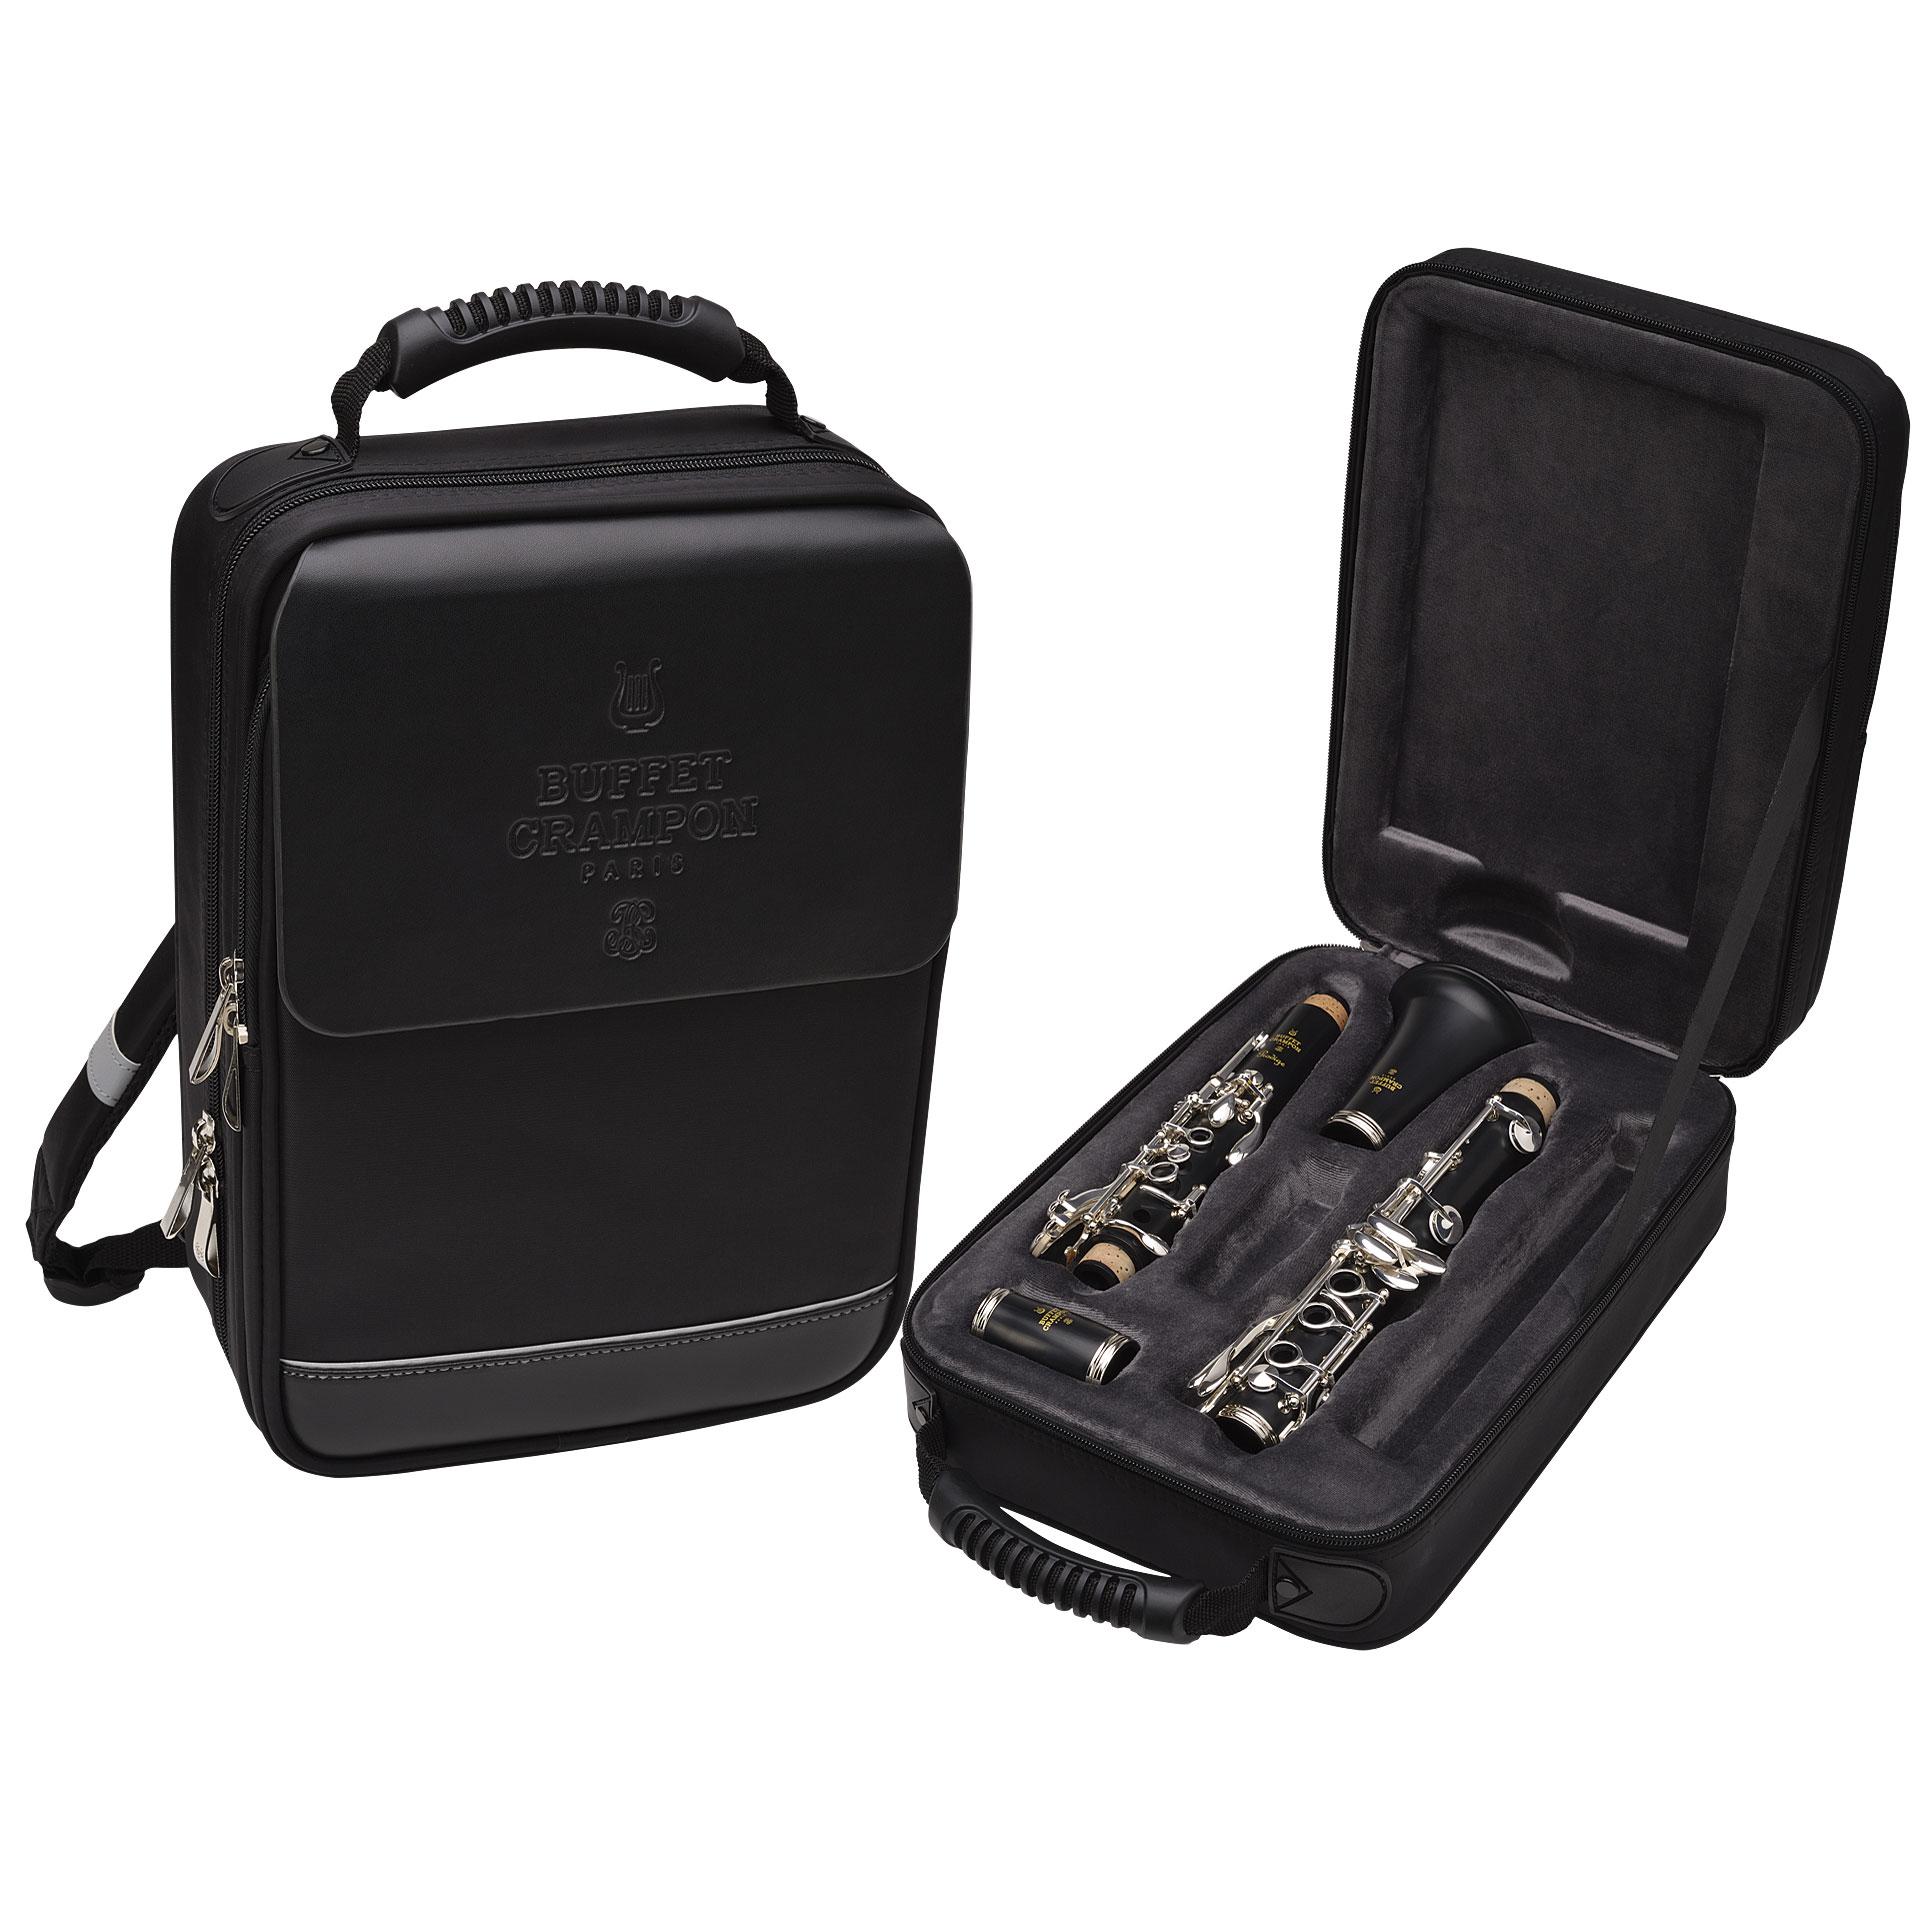 Clarinet Buffet Crampon Prodige BC 2541 Clarinet Buffet Crampon Prodige BC  2541 (2) ...